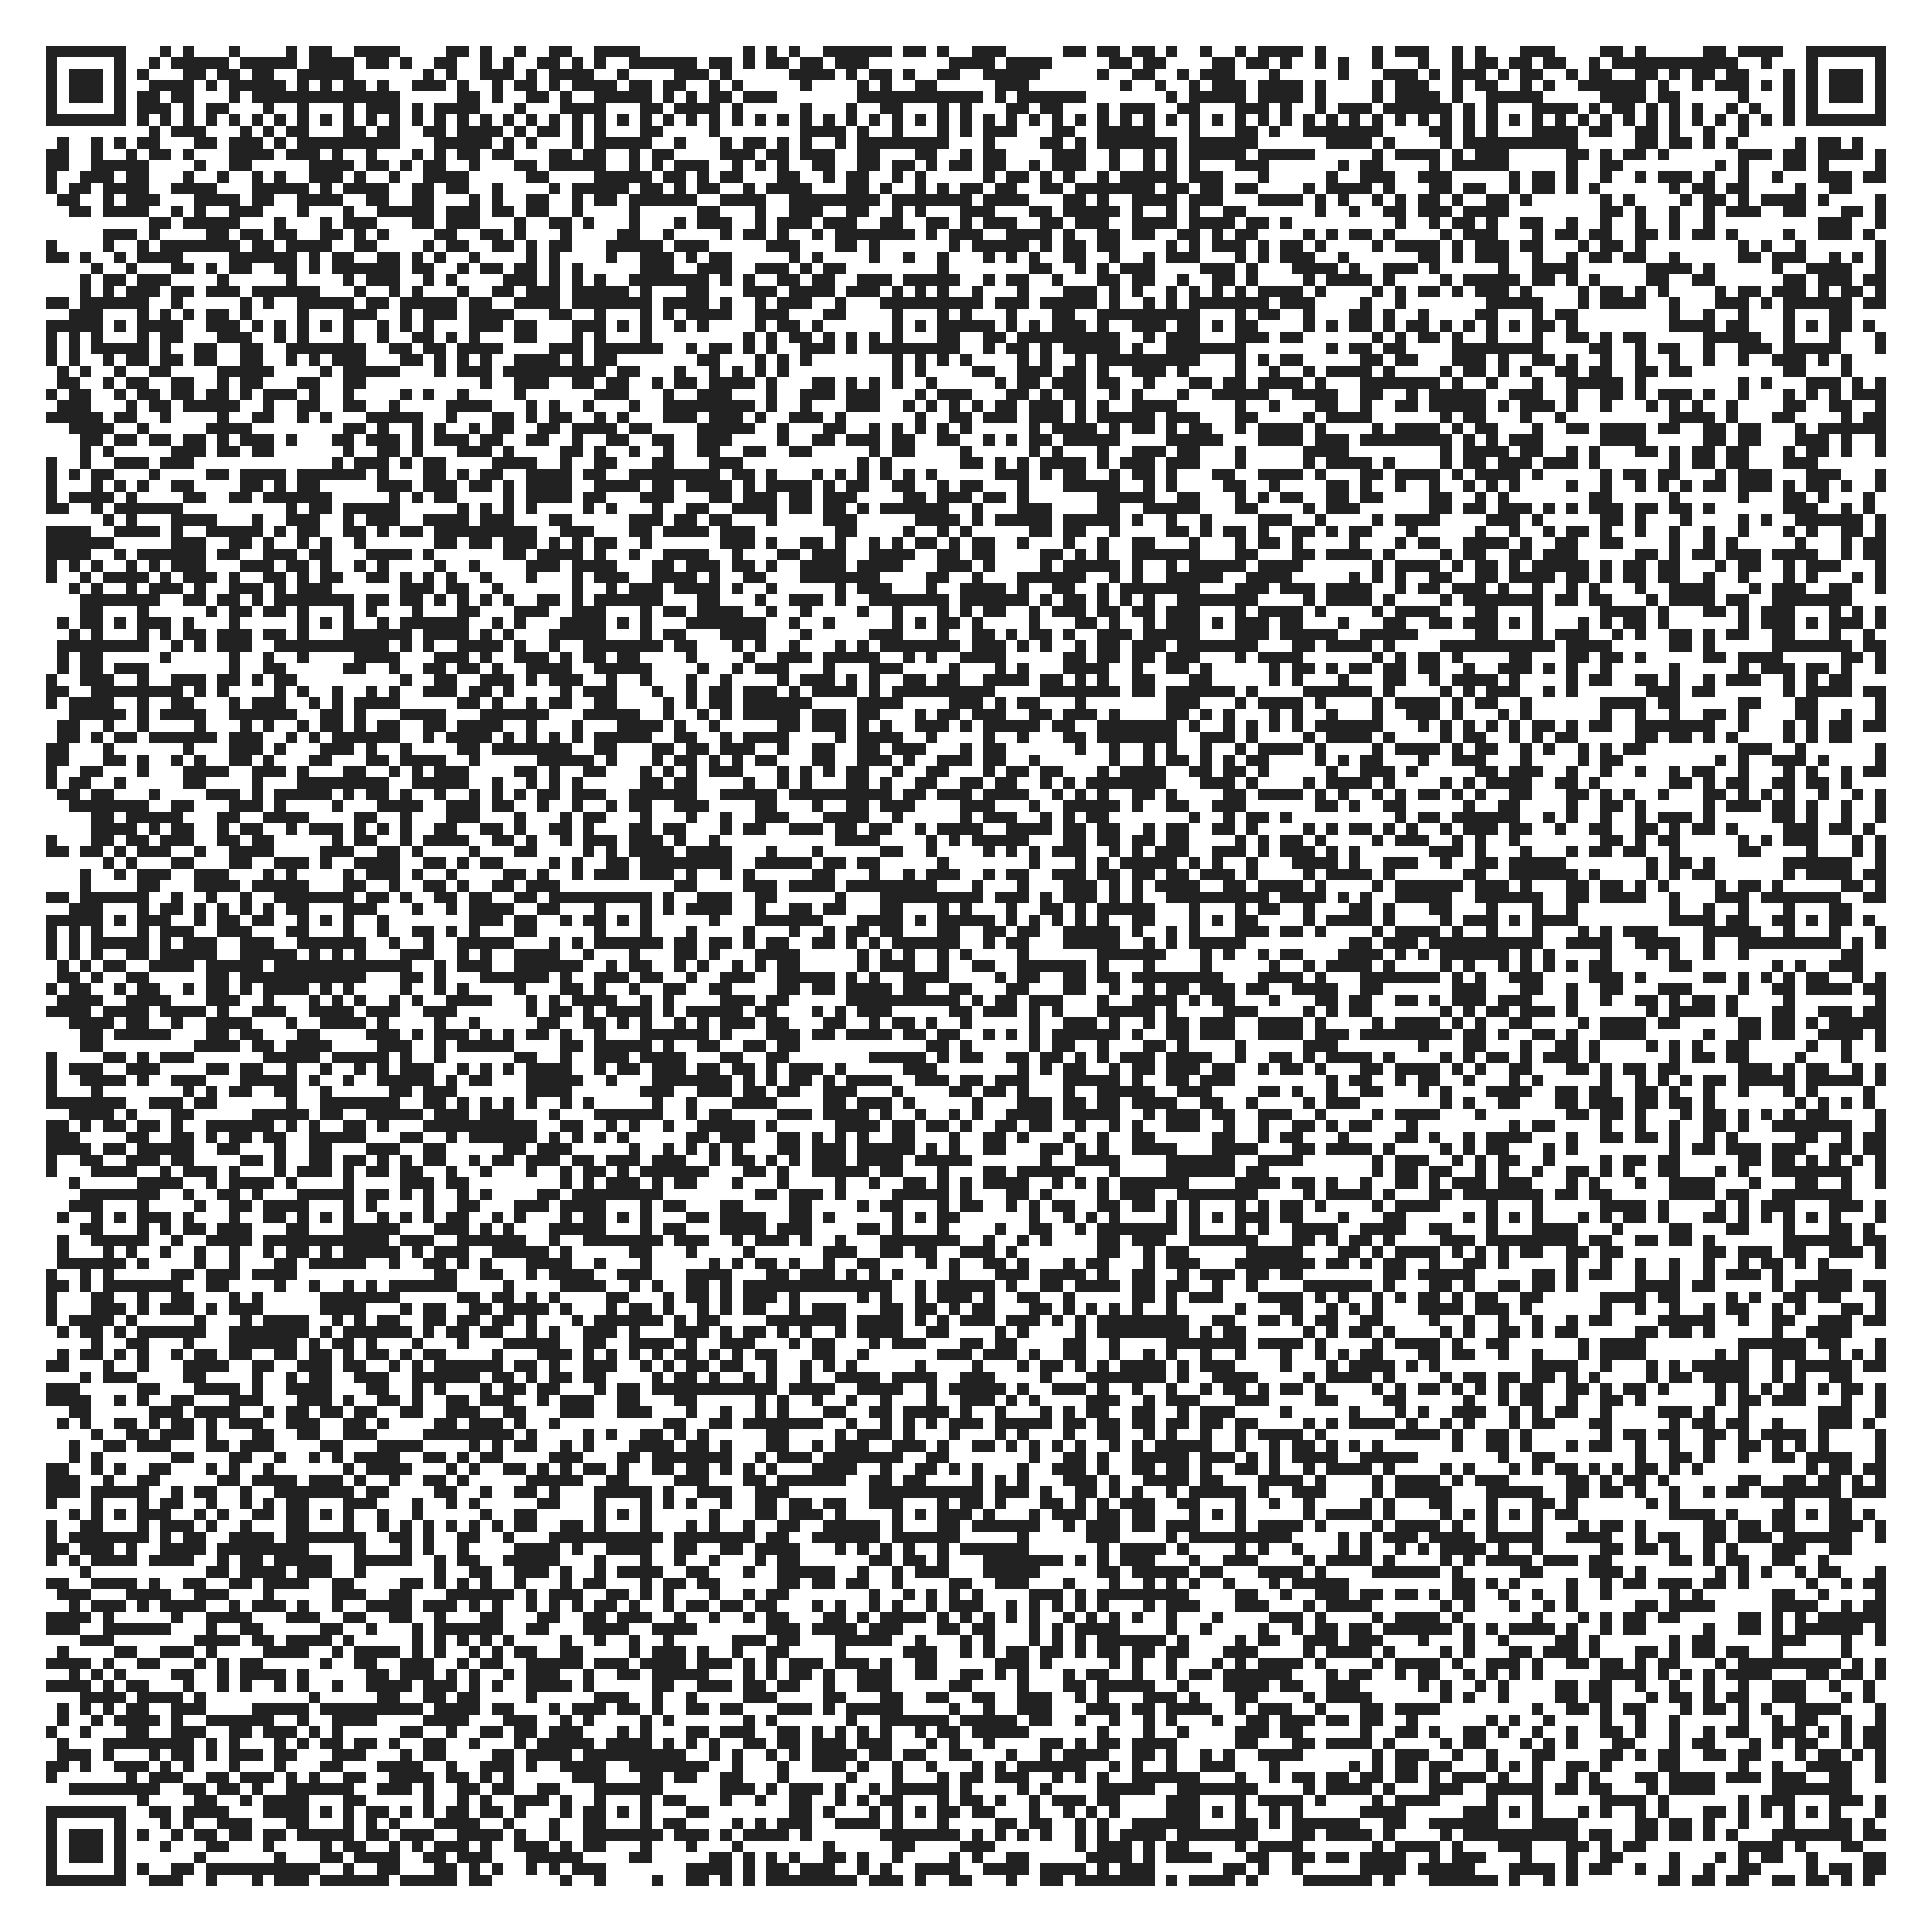 Apfelmag QR Code